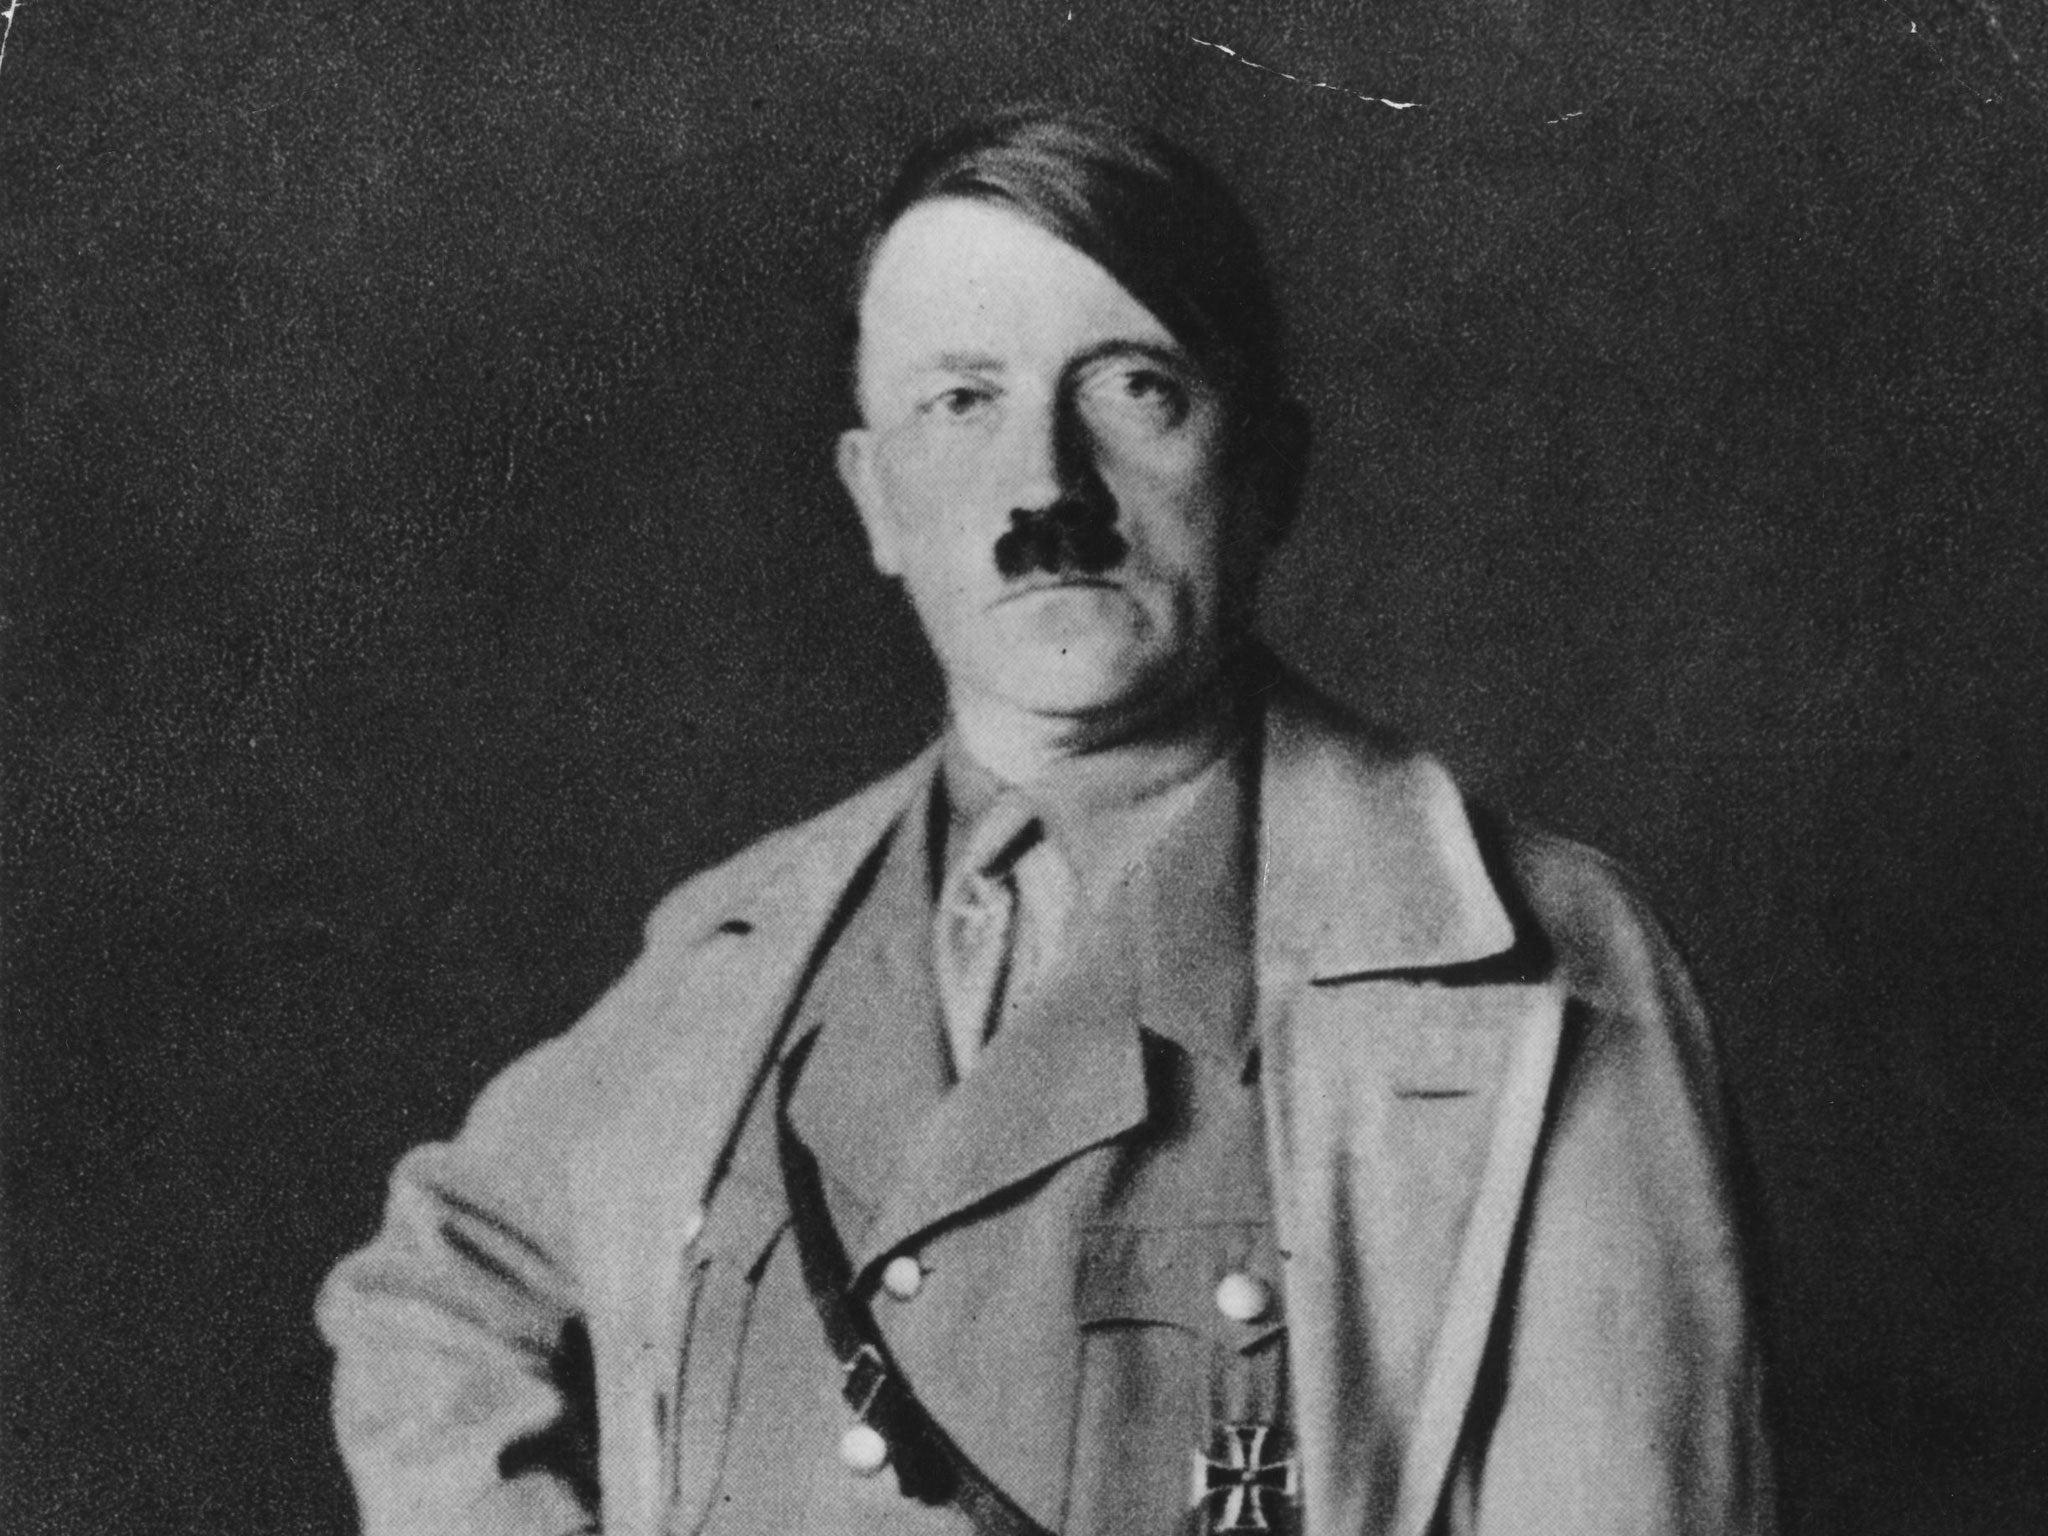 Hitler leadership essay